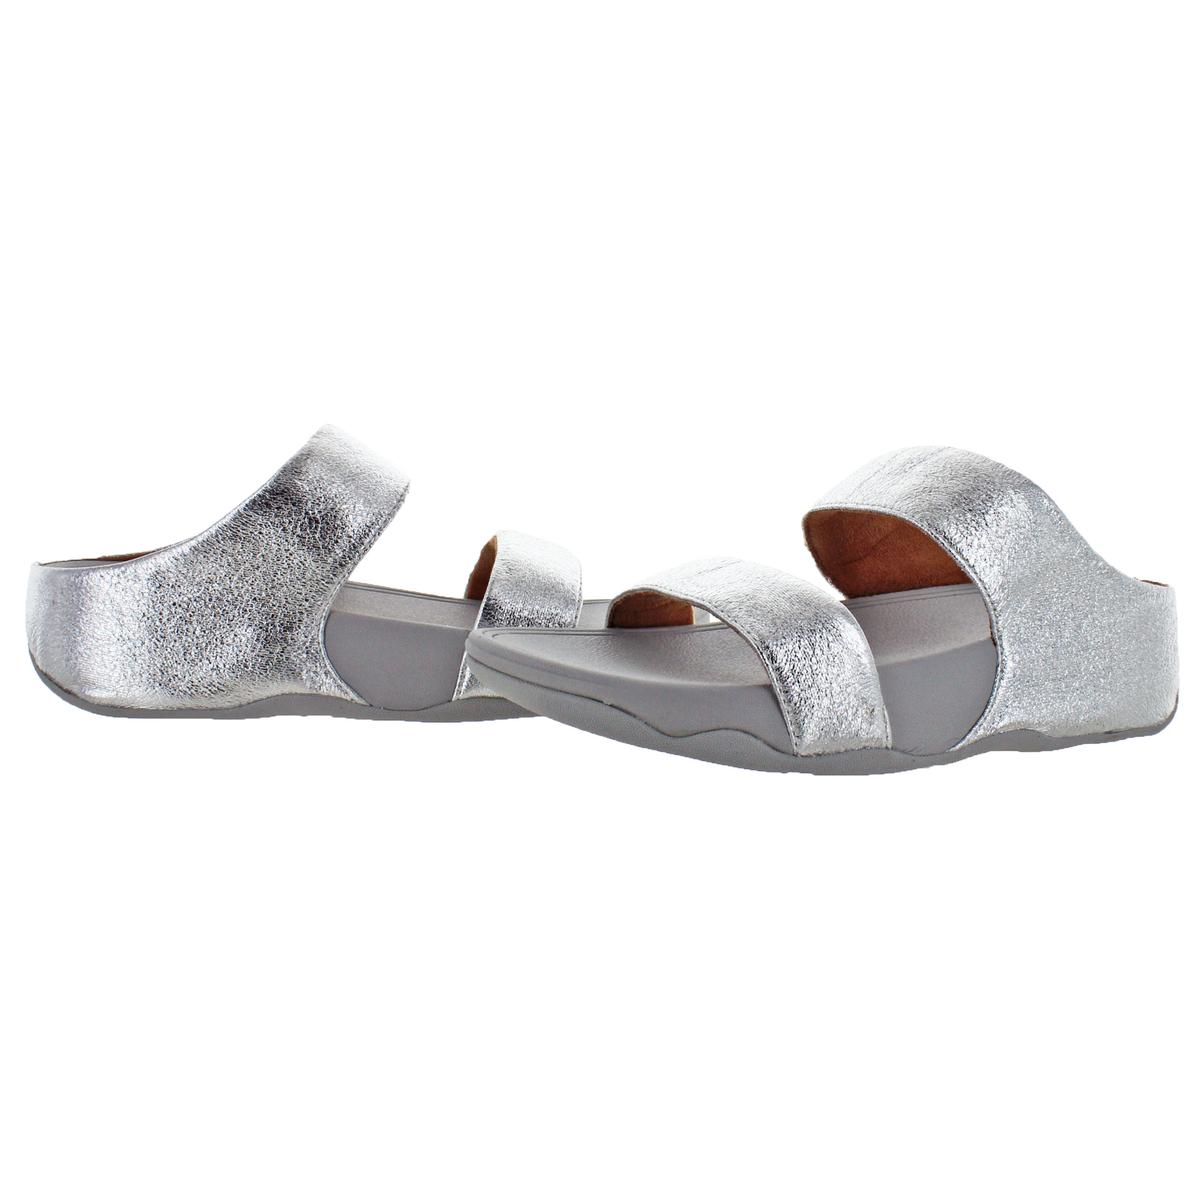 0f4545d359cf FitFlop Women s Lulu Glitzy Slide Leather Wedge Sandals